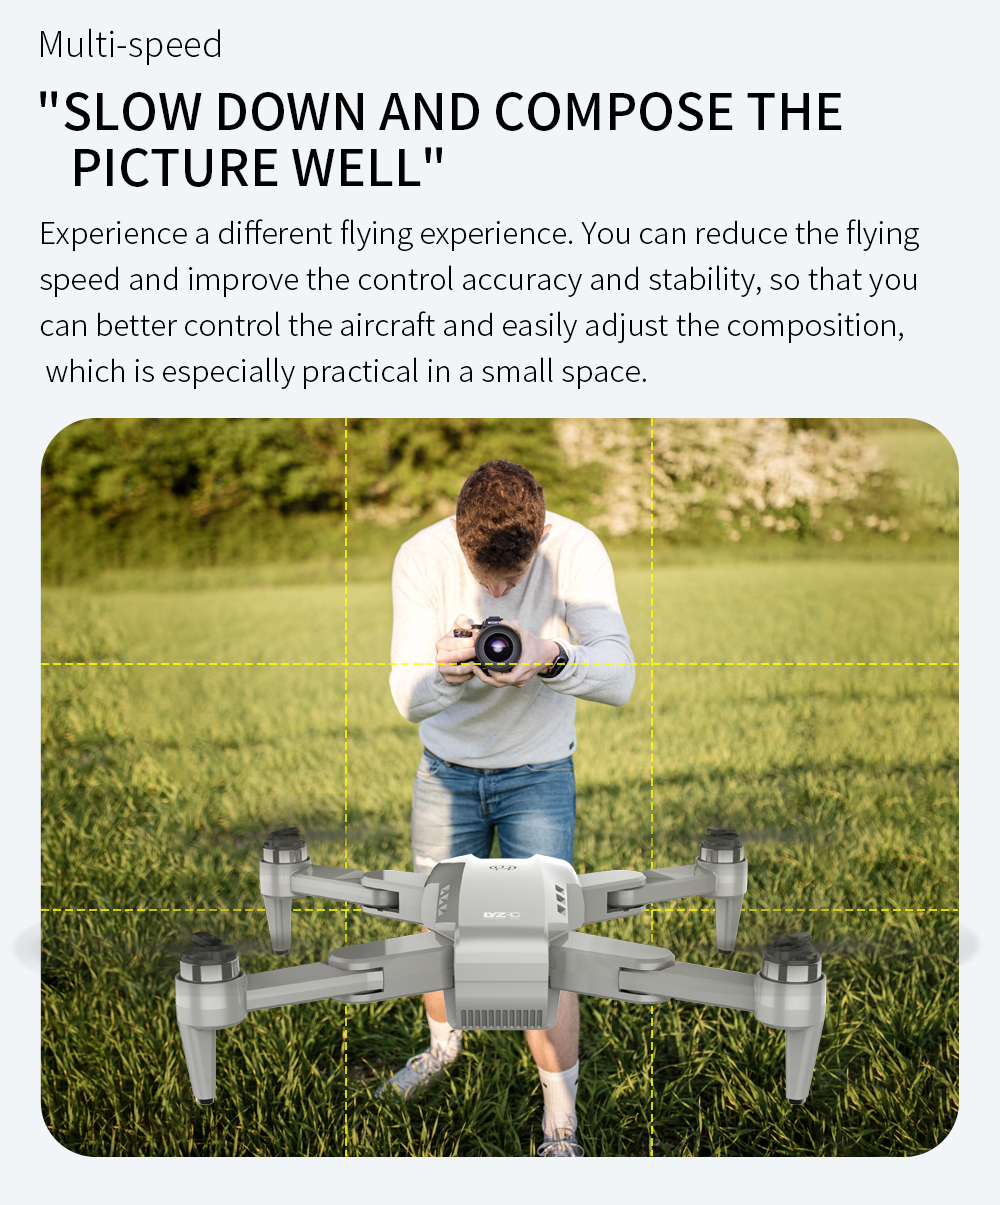 H00bf56fbfa3d4bedbac1f09572f98fec7 - L900 Pro Drone 4K Professional 5G WIFI GPS Dron With HD Camera FPV 28min Flight Time Brushless Motor Quadcopter Distance 1.2km